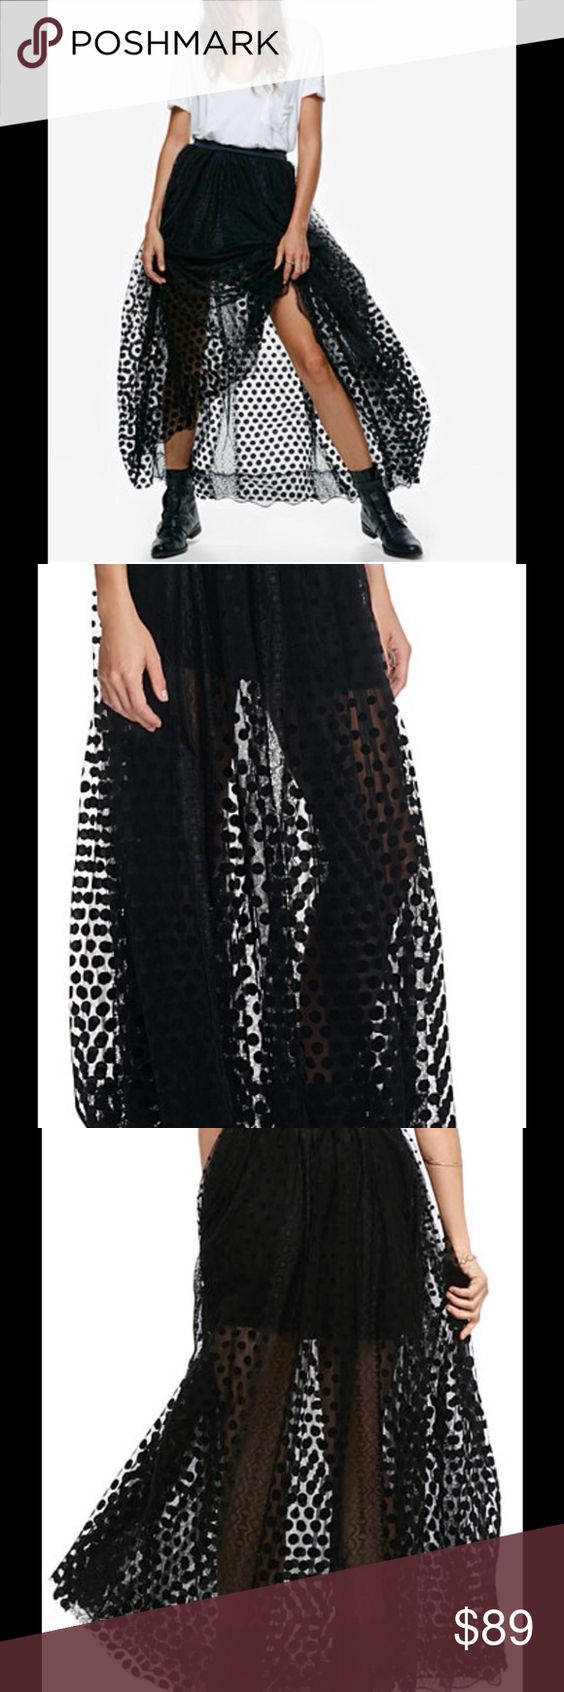 Free People sheer mini/ maxi skirt NWT